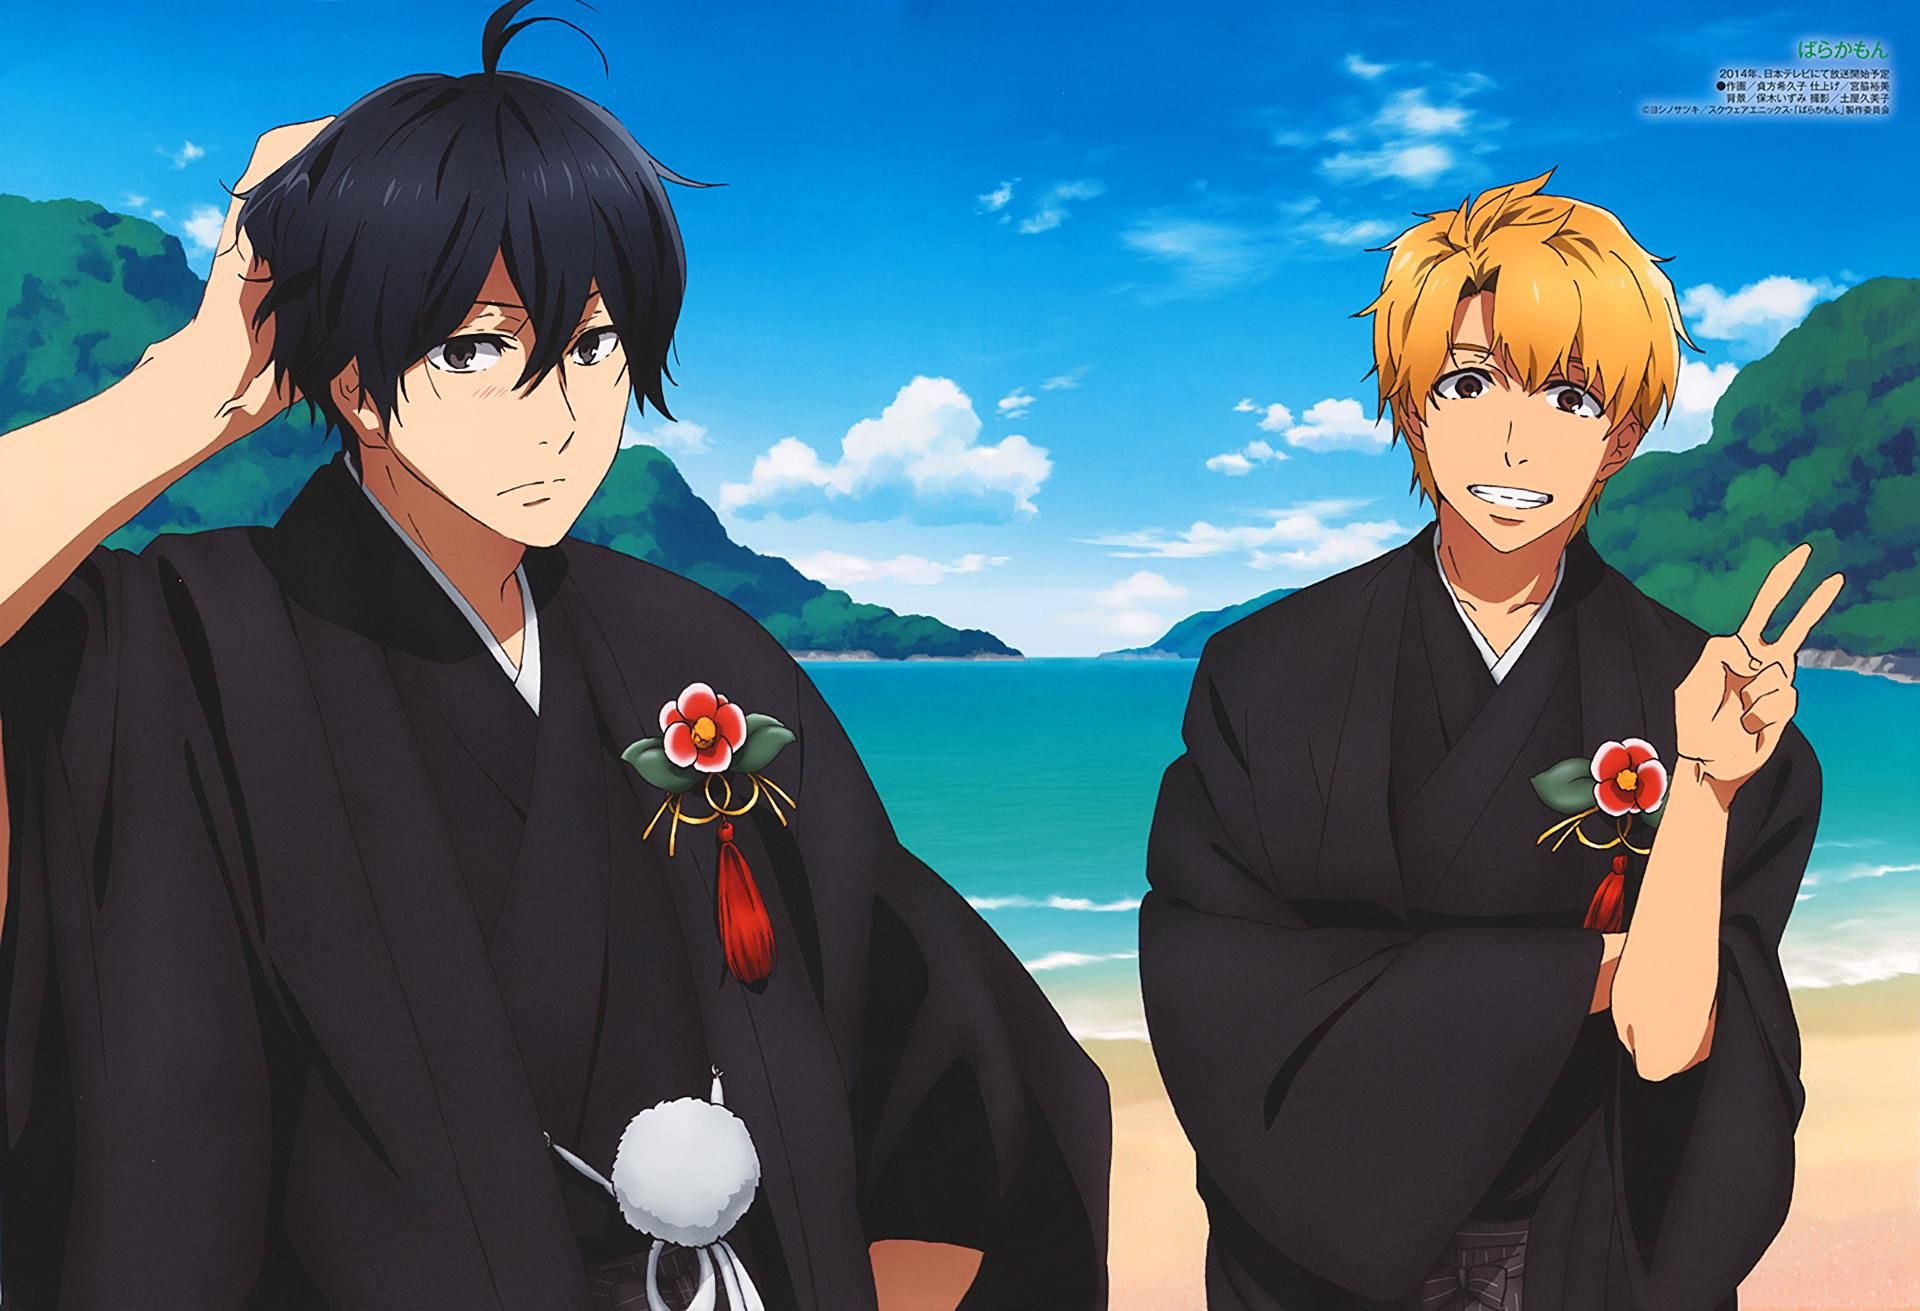 Anime Barakamon Hiroshi Kido Seishuu Handa Wallpaper in